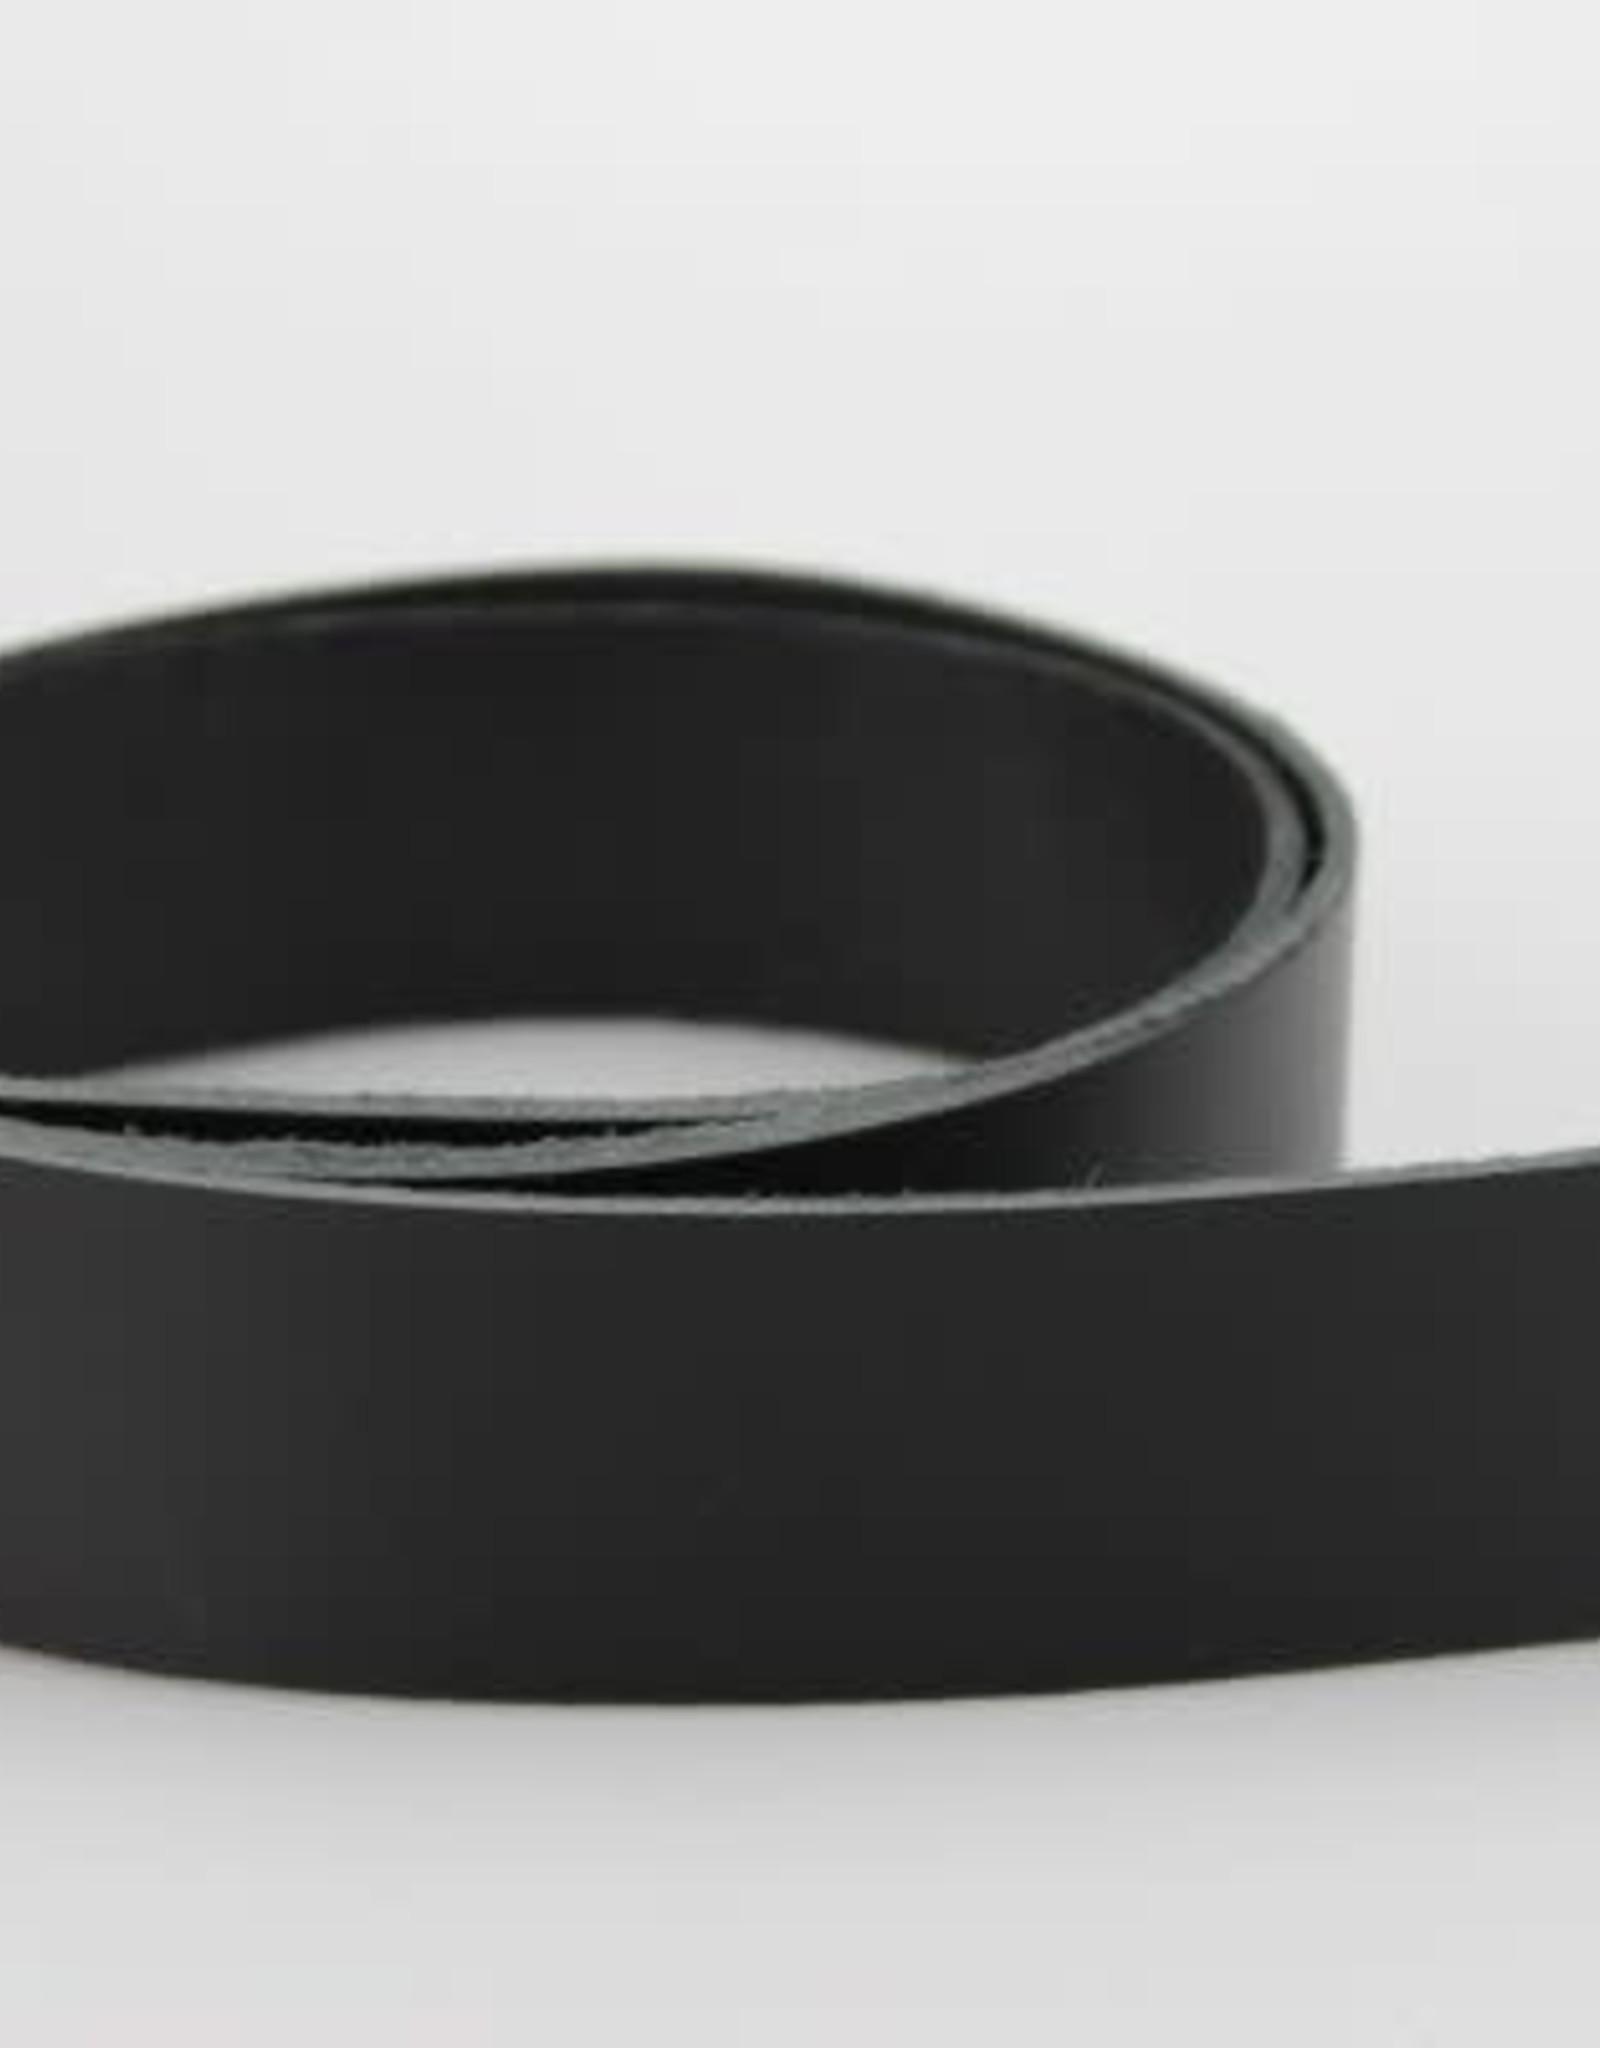 Lederen riem zwart 2.5cm x ca. 120 cm